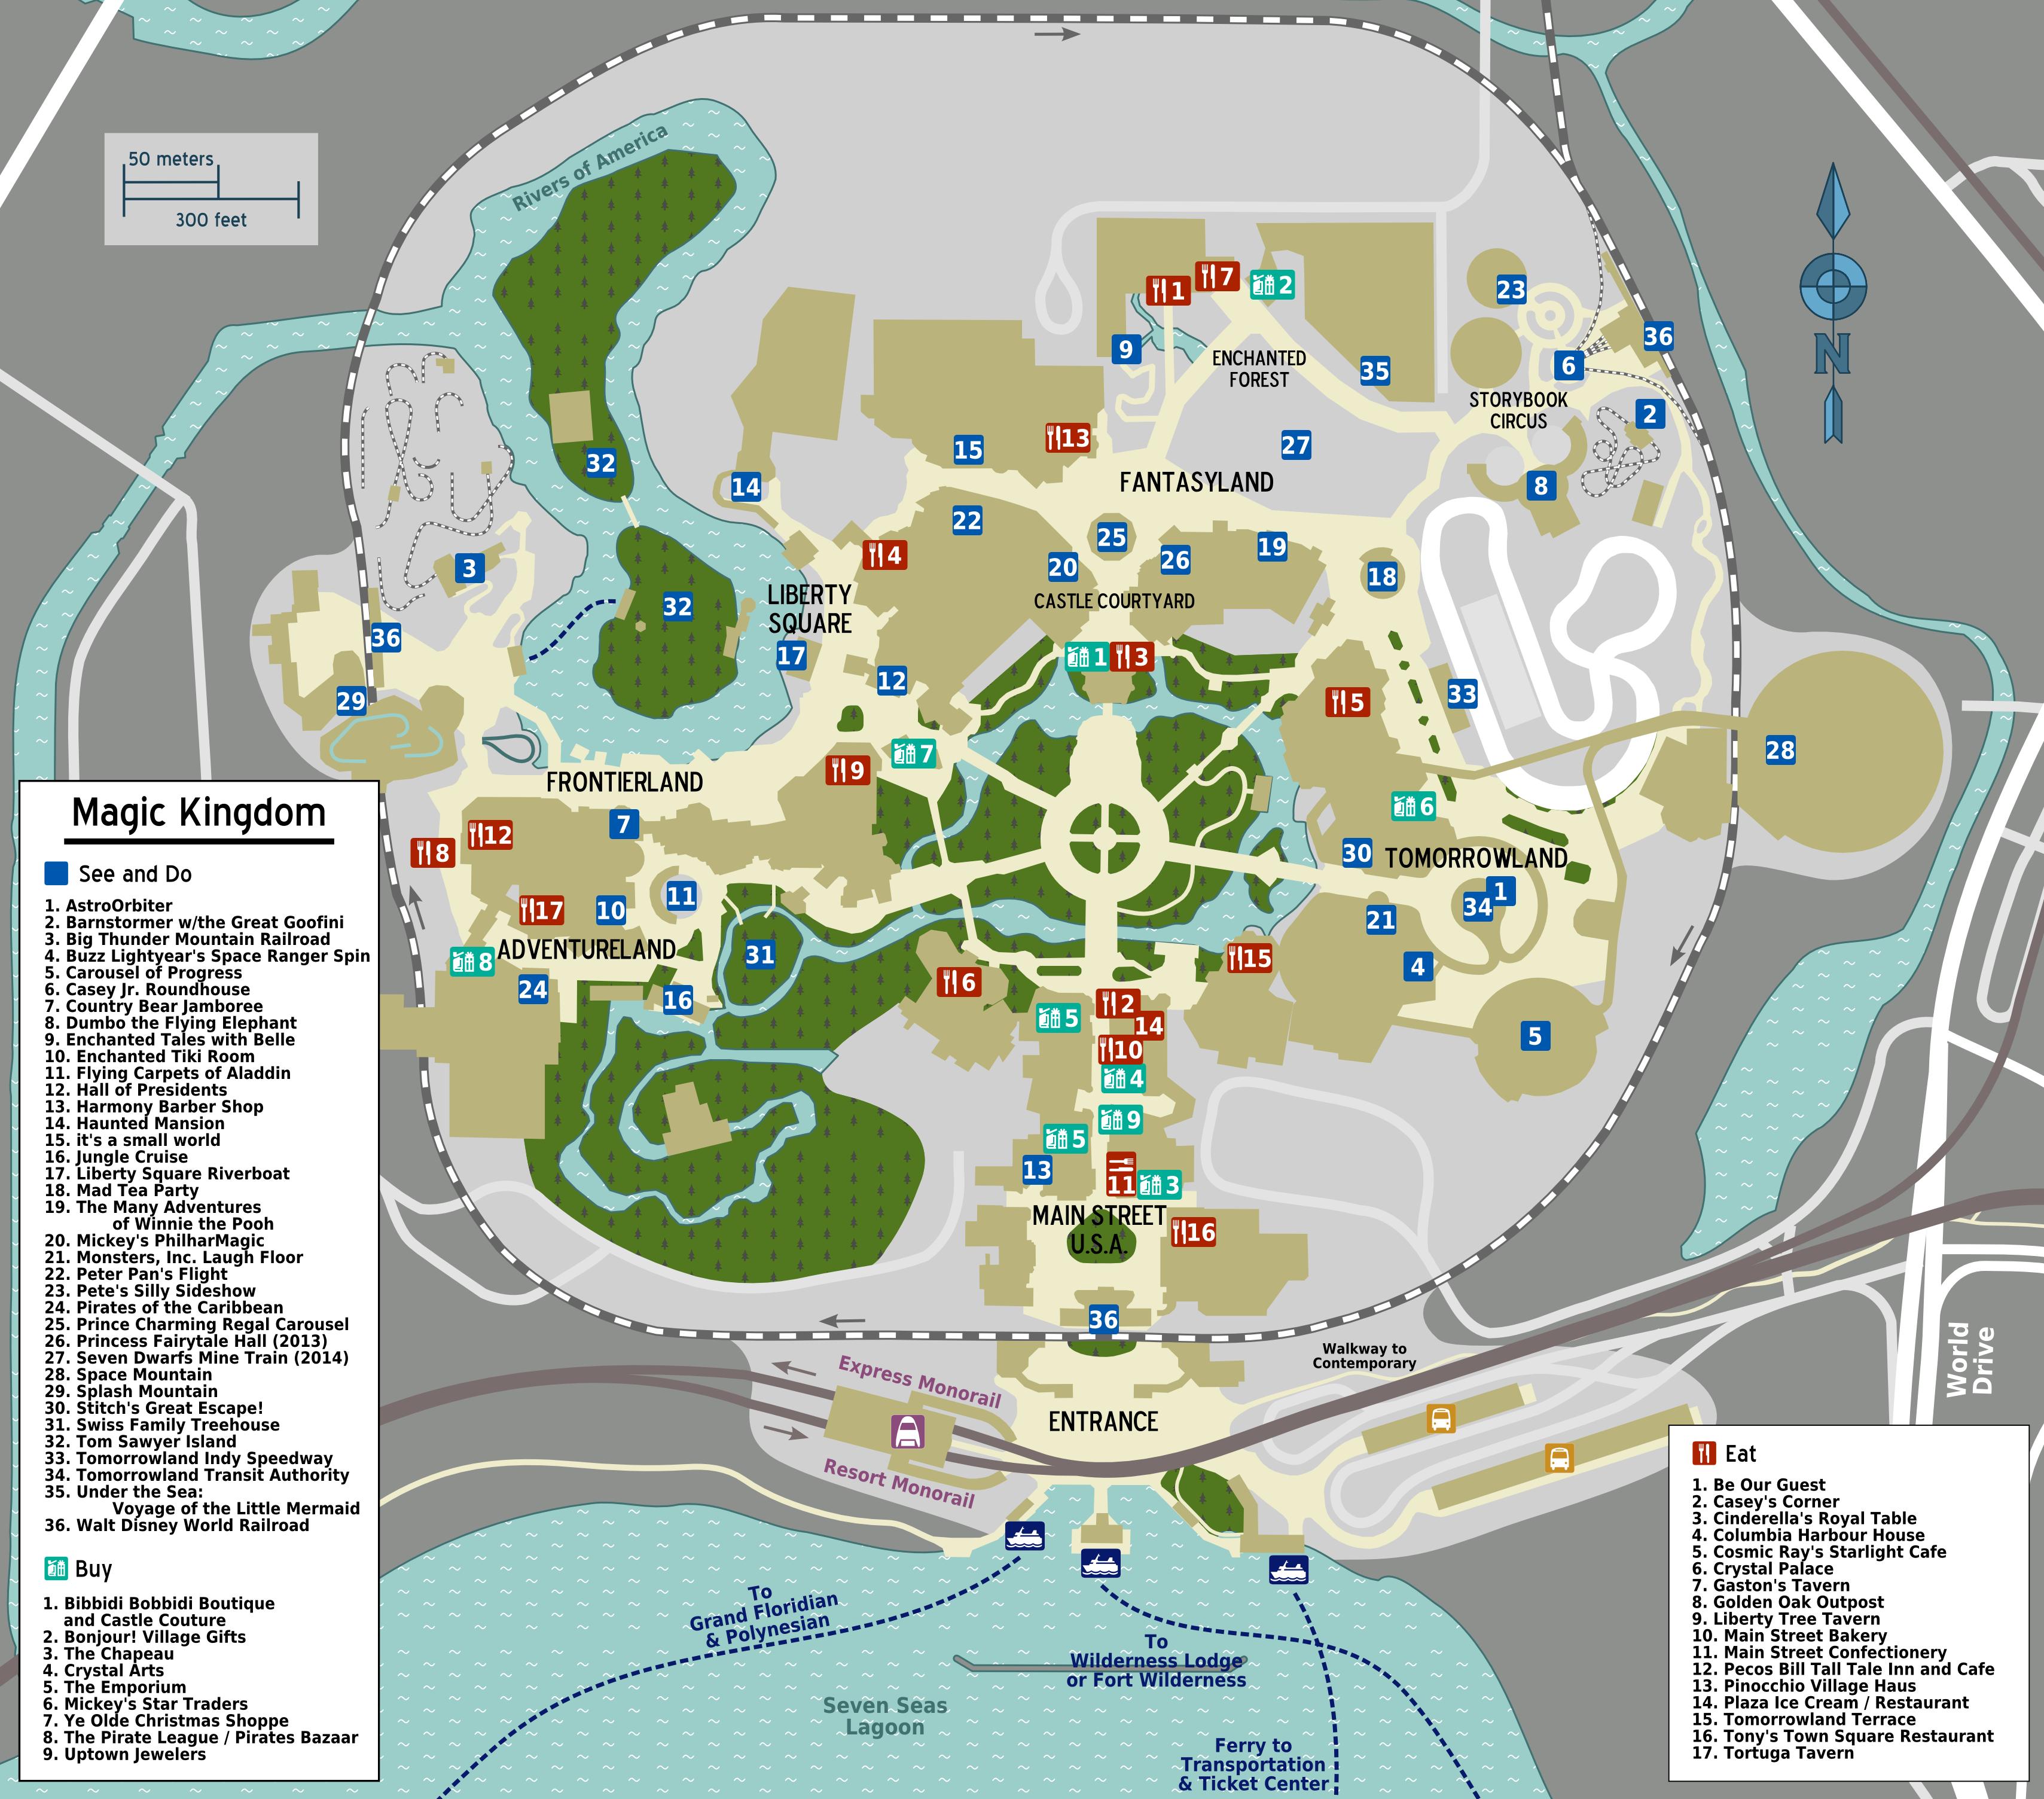 Downtown Disney Walt Disney World Wikipedia The Free 2016 Car Release Date